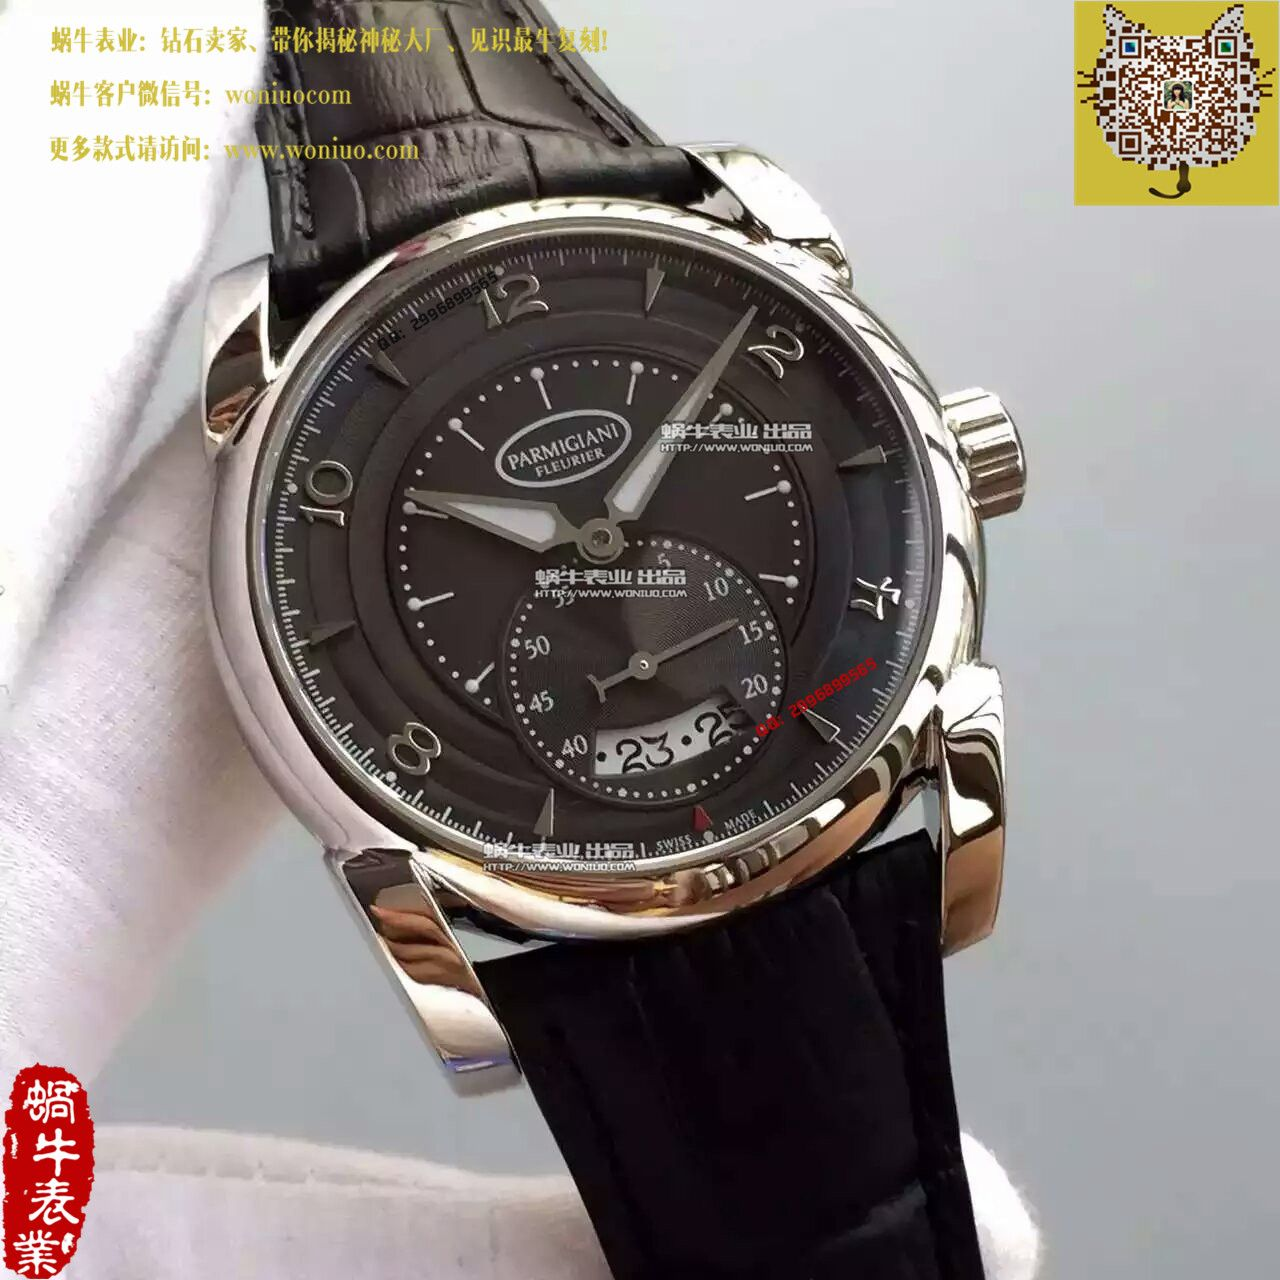 【TF厂1:1精仿手表】帕玛强尼Tonda系列PF012505.01 表经42mm腕表